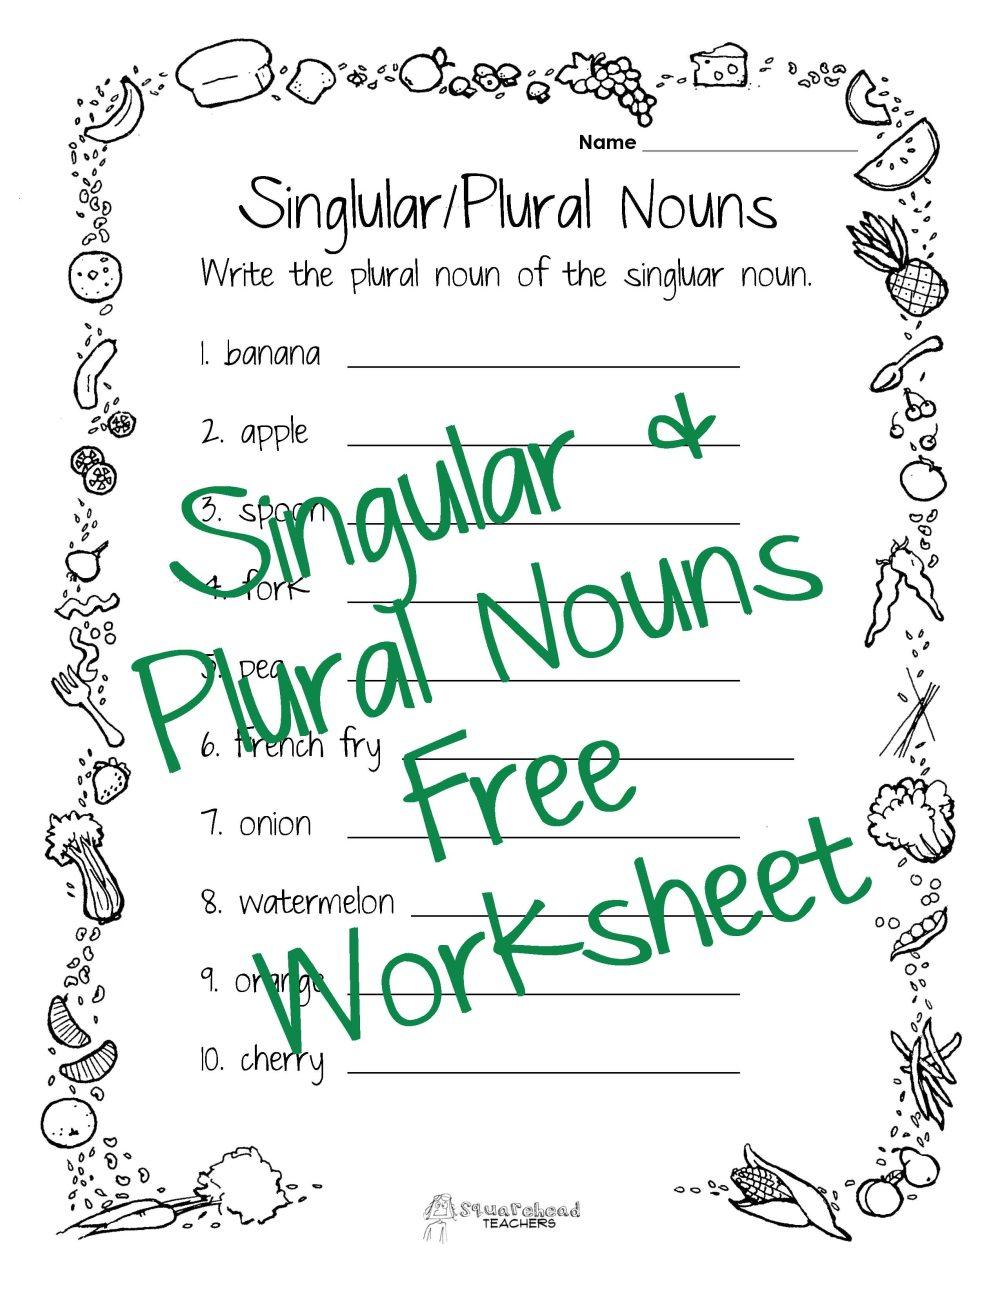 medium resolution of Homework Help With Plural Nouns - Plural Nouns And Singular Nouns Homework  Worksheets